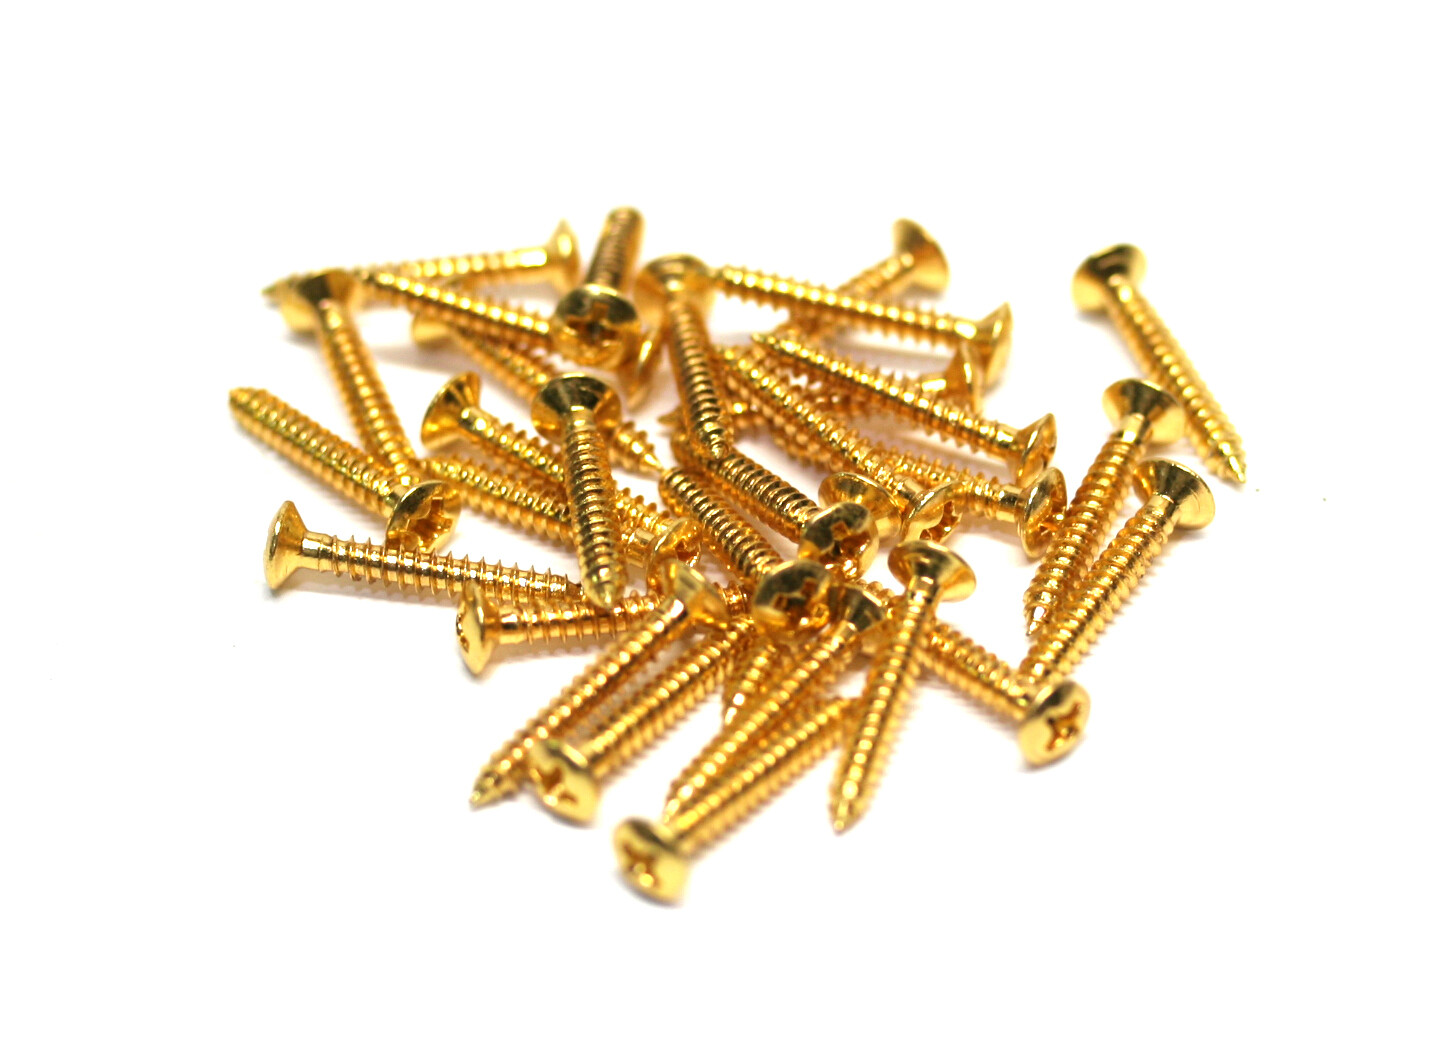 Brio 10 Pack Bridge Mounting Screws 3mmD 22mm L Gold